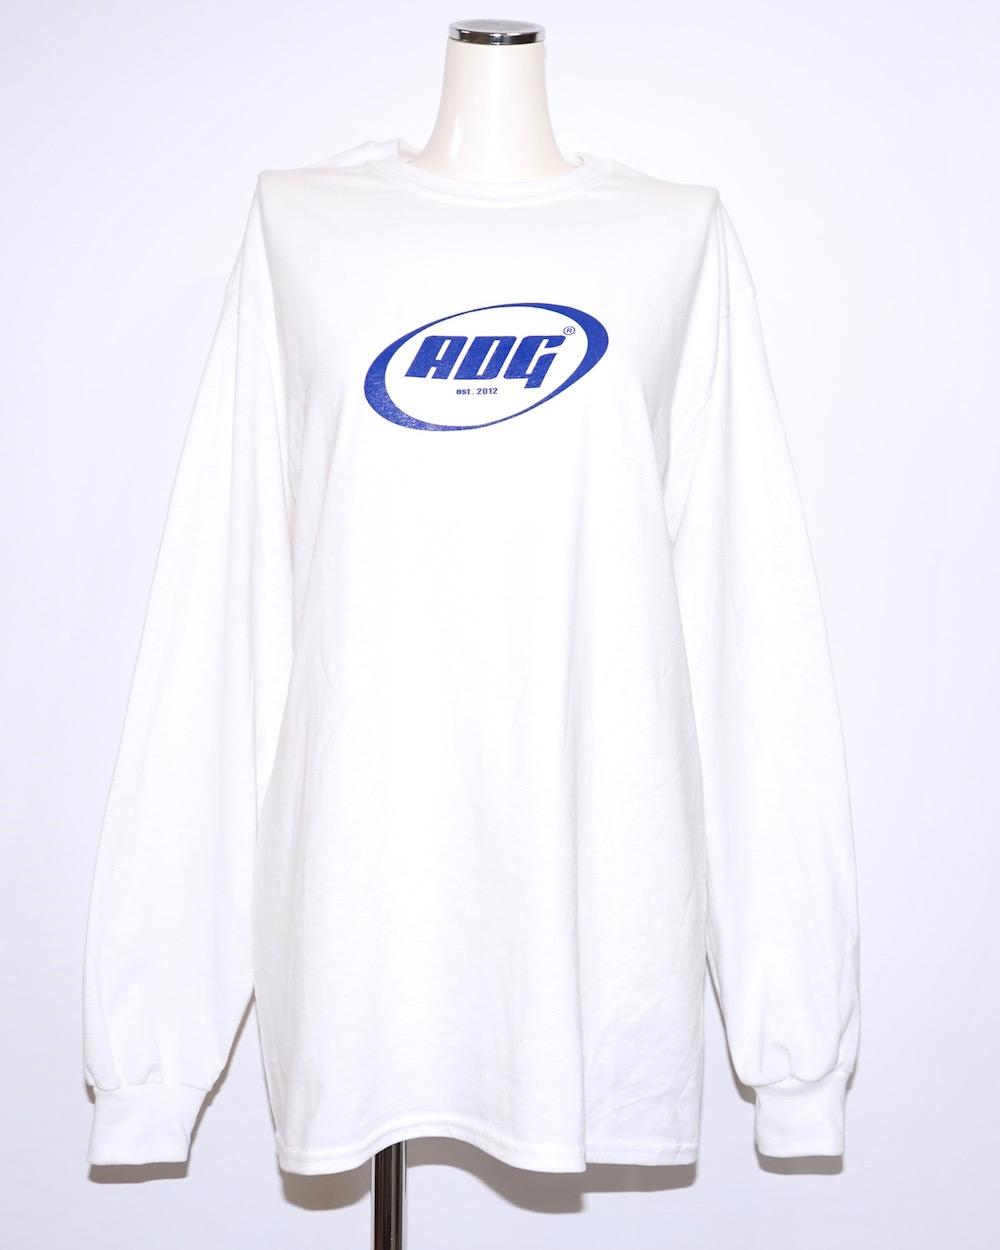 ADG OVAL LOGO BIG L/S TEE (white-blue logo)